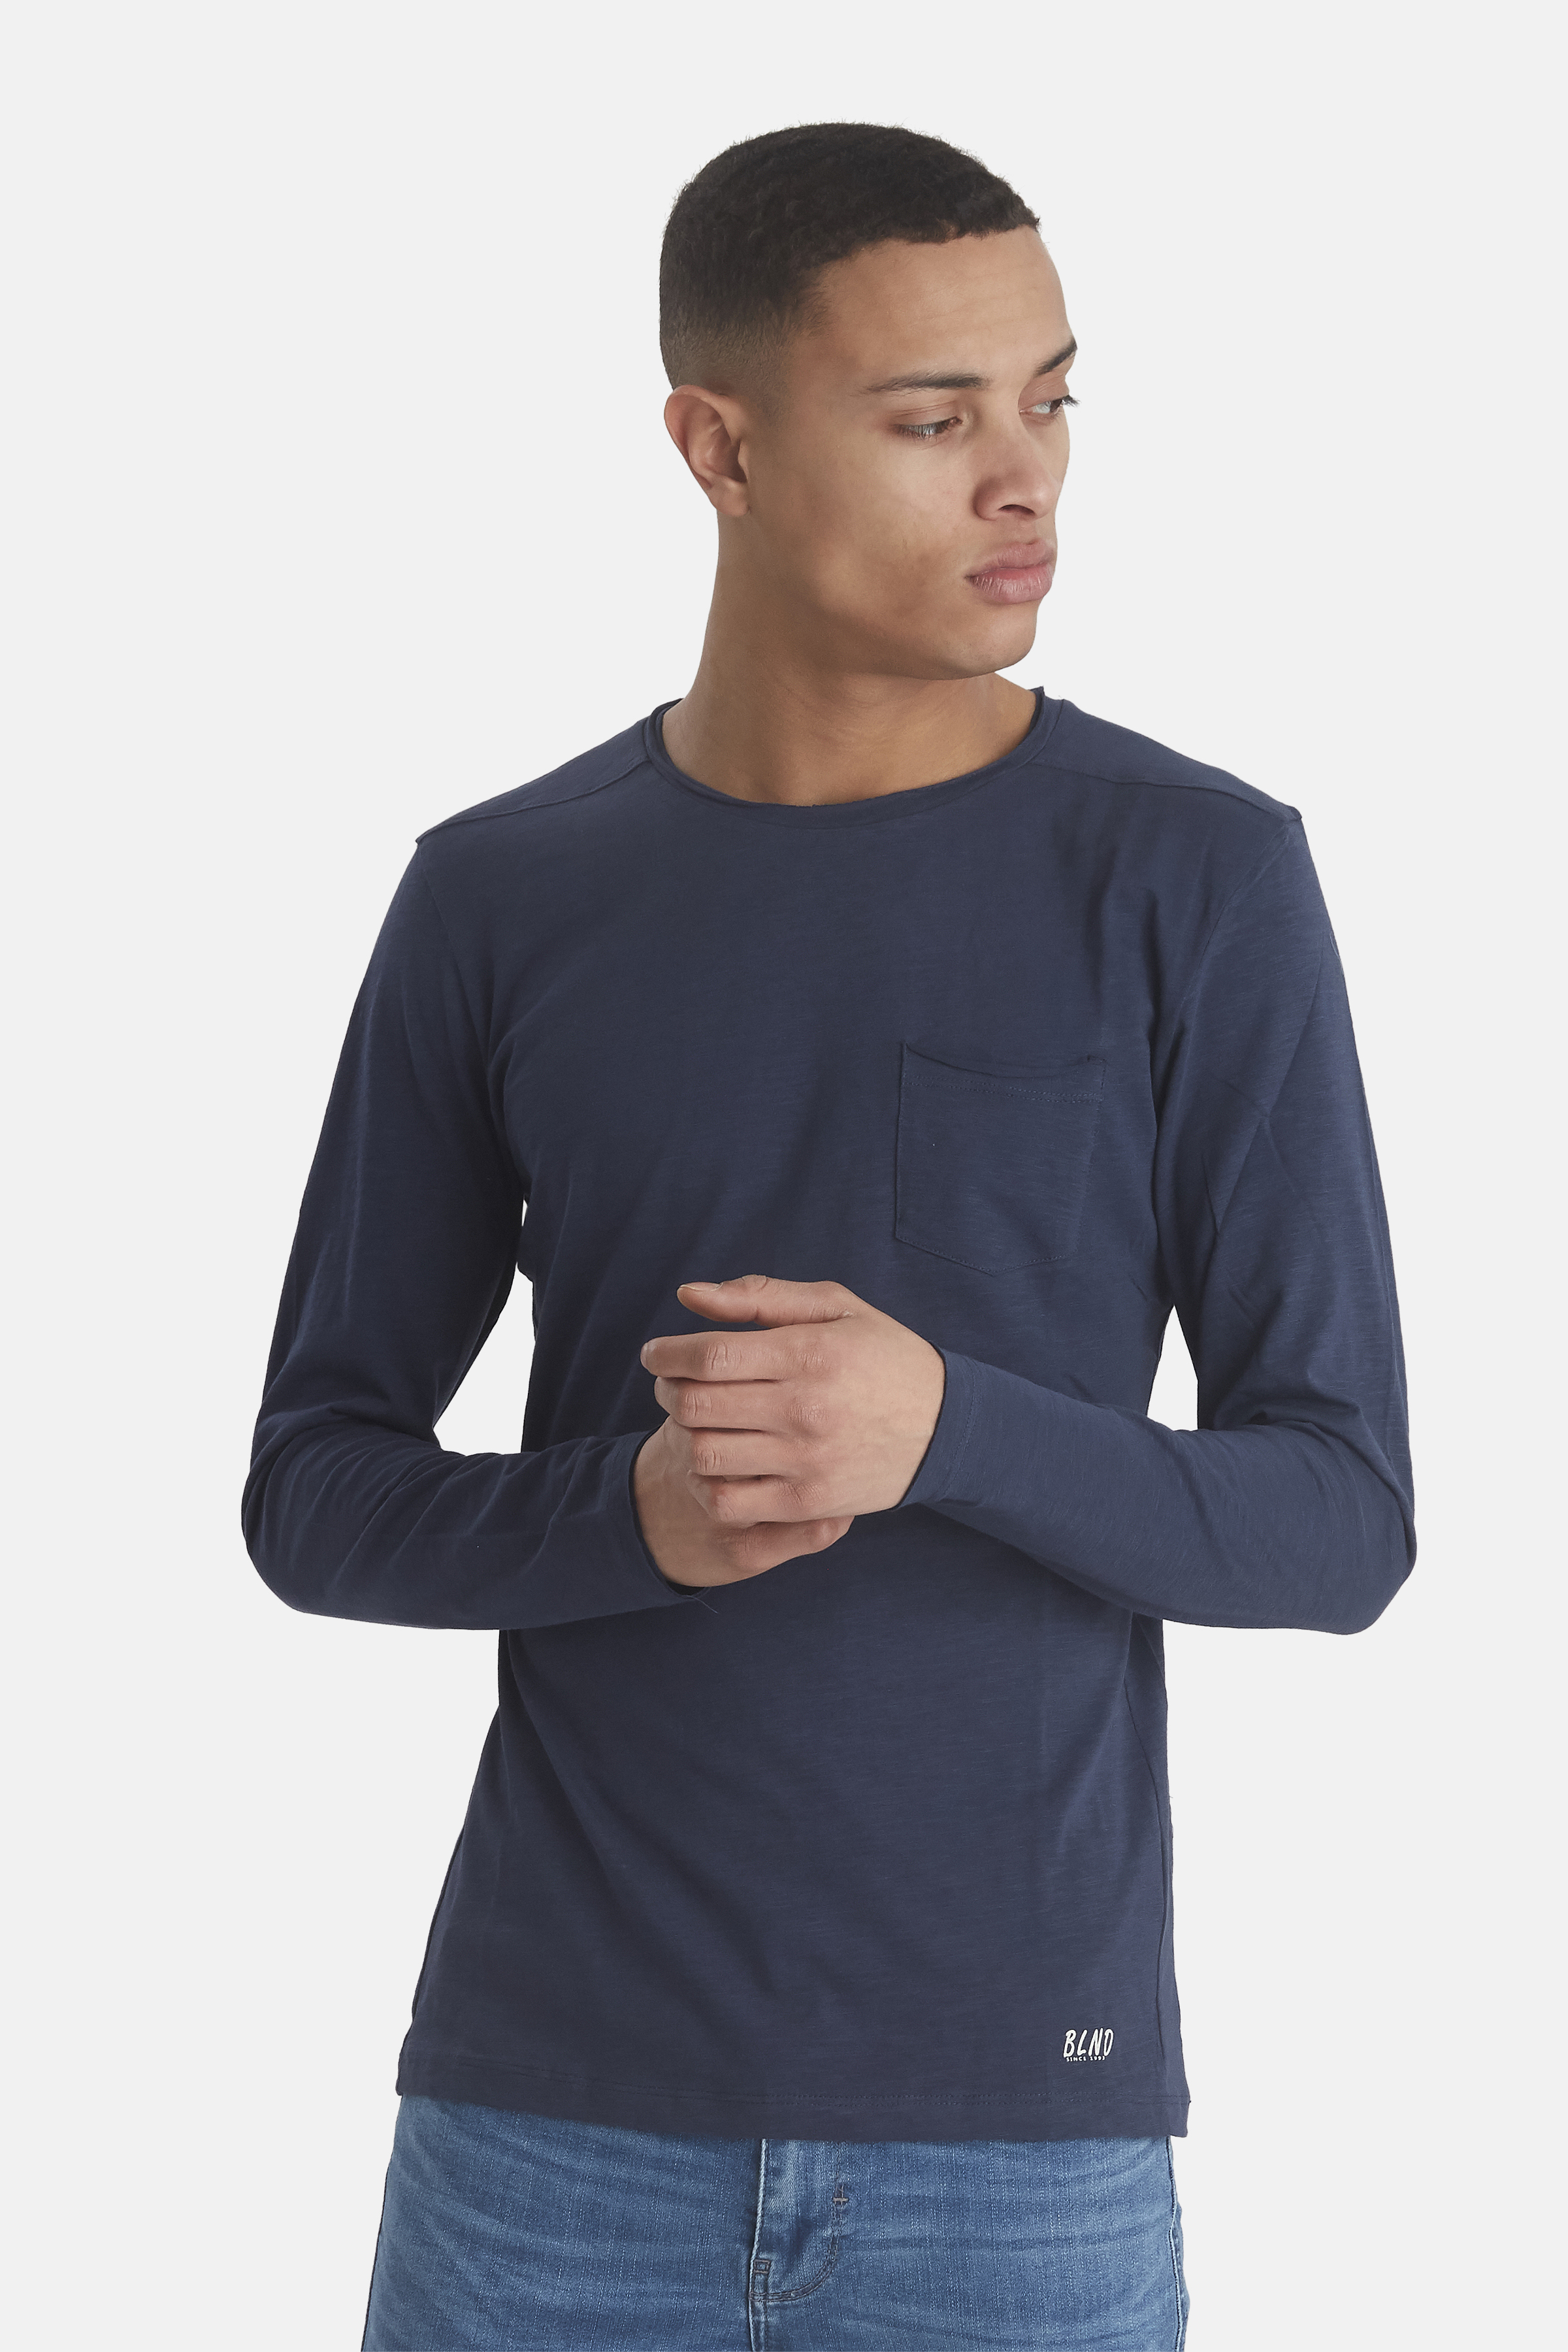 Navy BHNICOLAI Langærmet T-shirt – Køb Navy BHNICOLAI Langærmet T-shirt fra str. S-3XL her